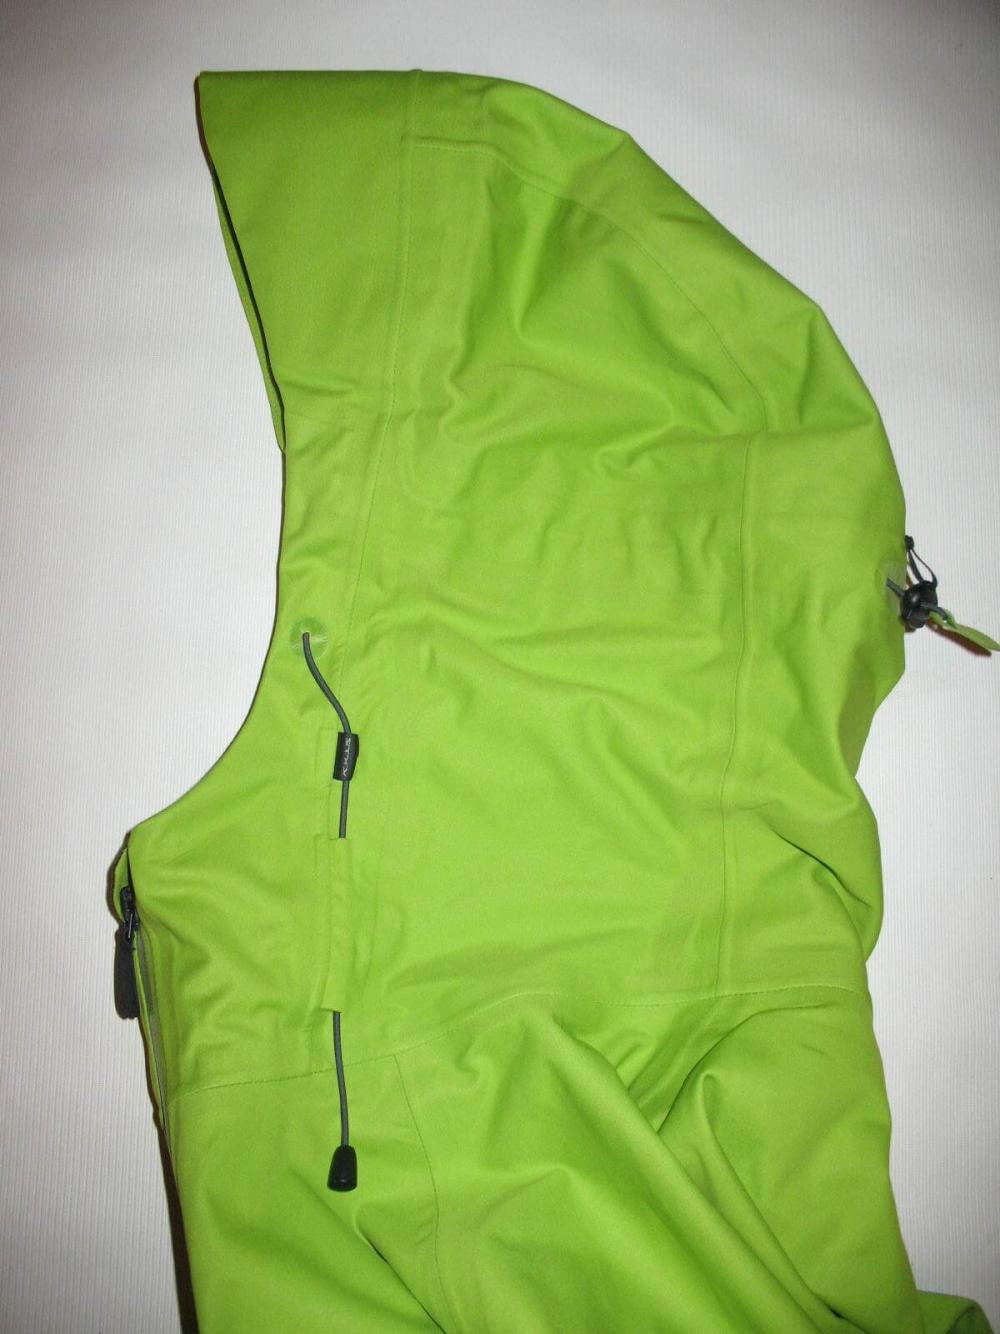 Куртка KJUS fasttrack 3L jacket (размер 56/XXL) - 5